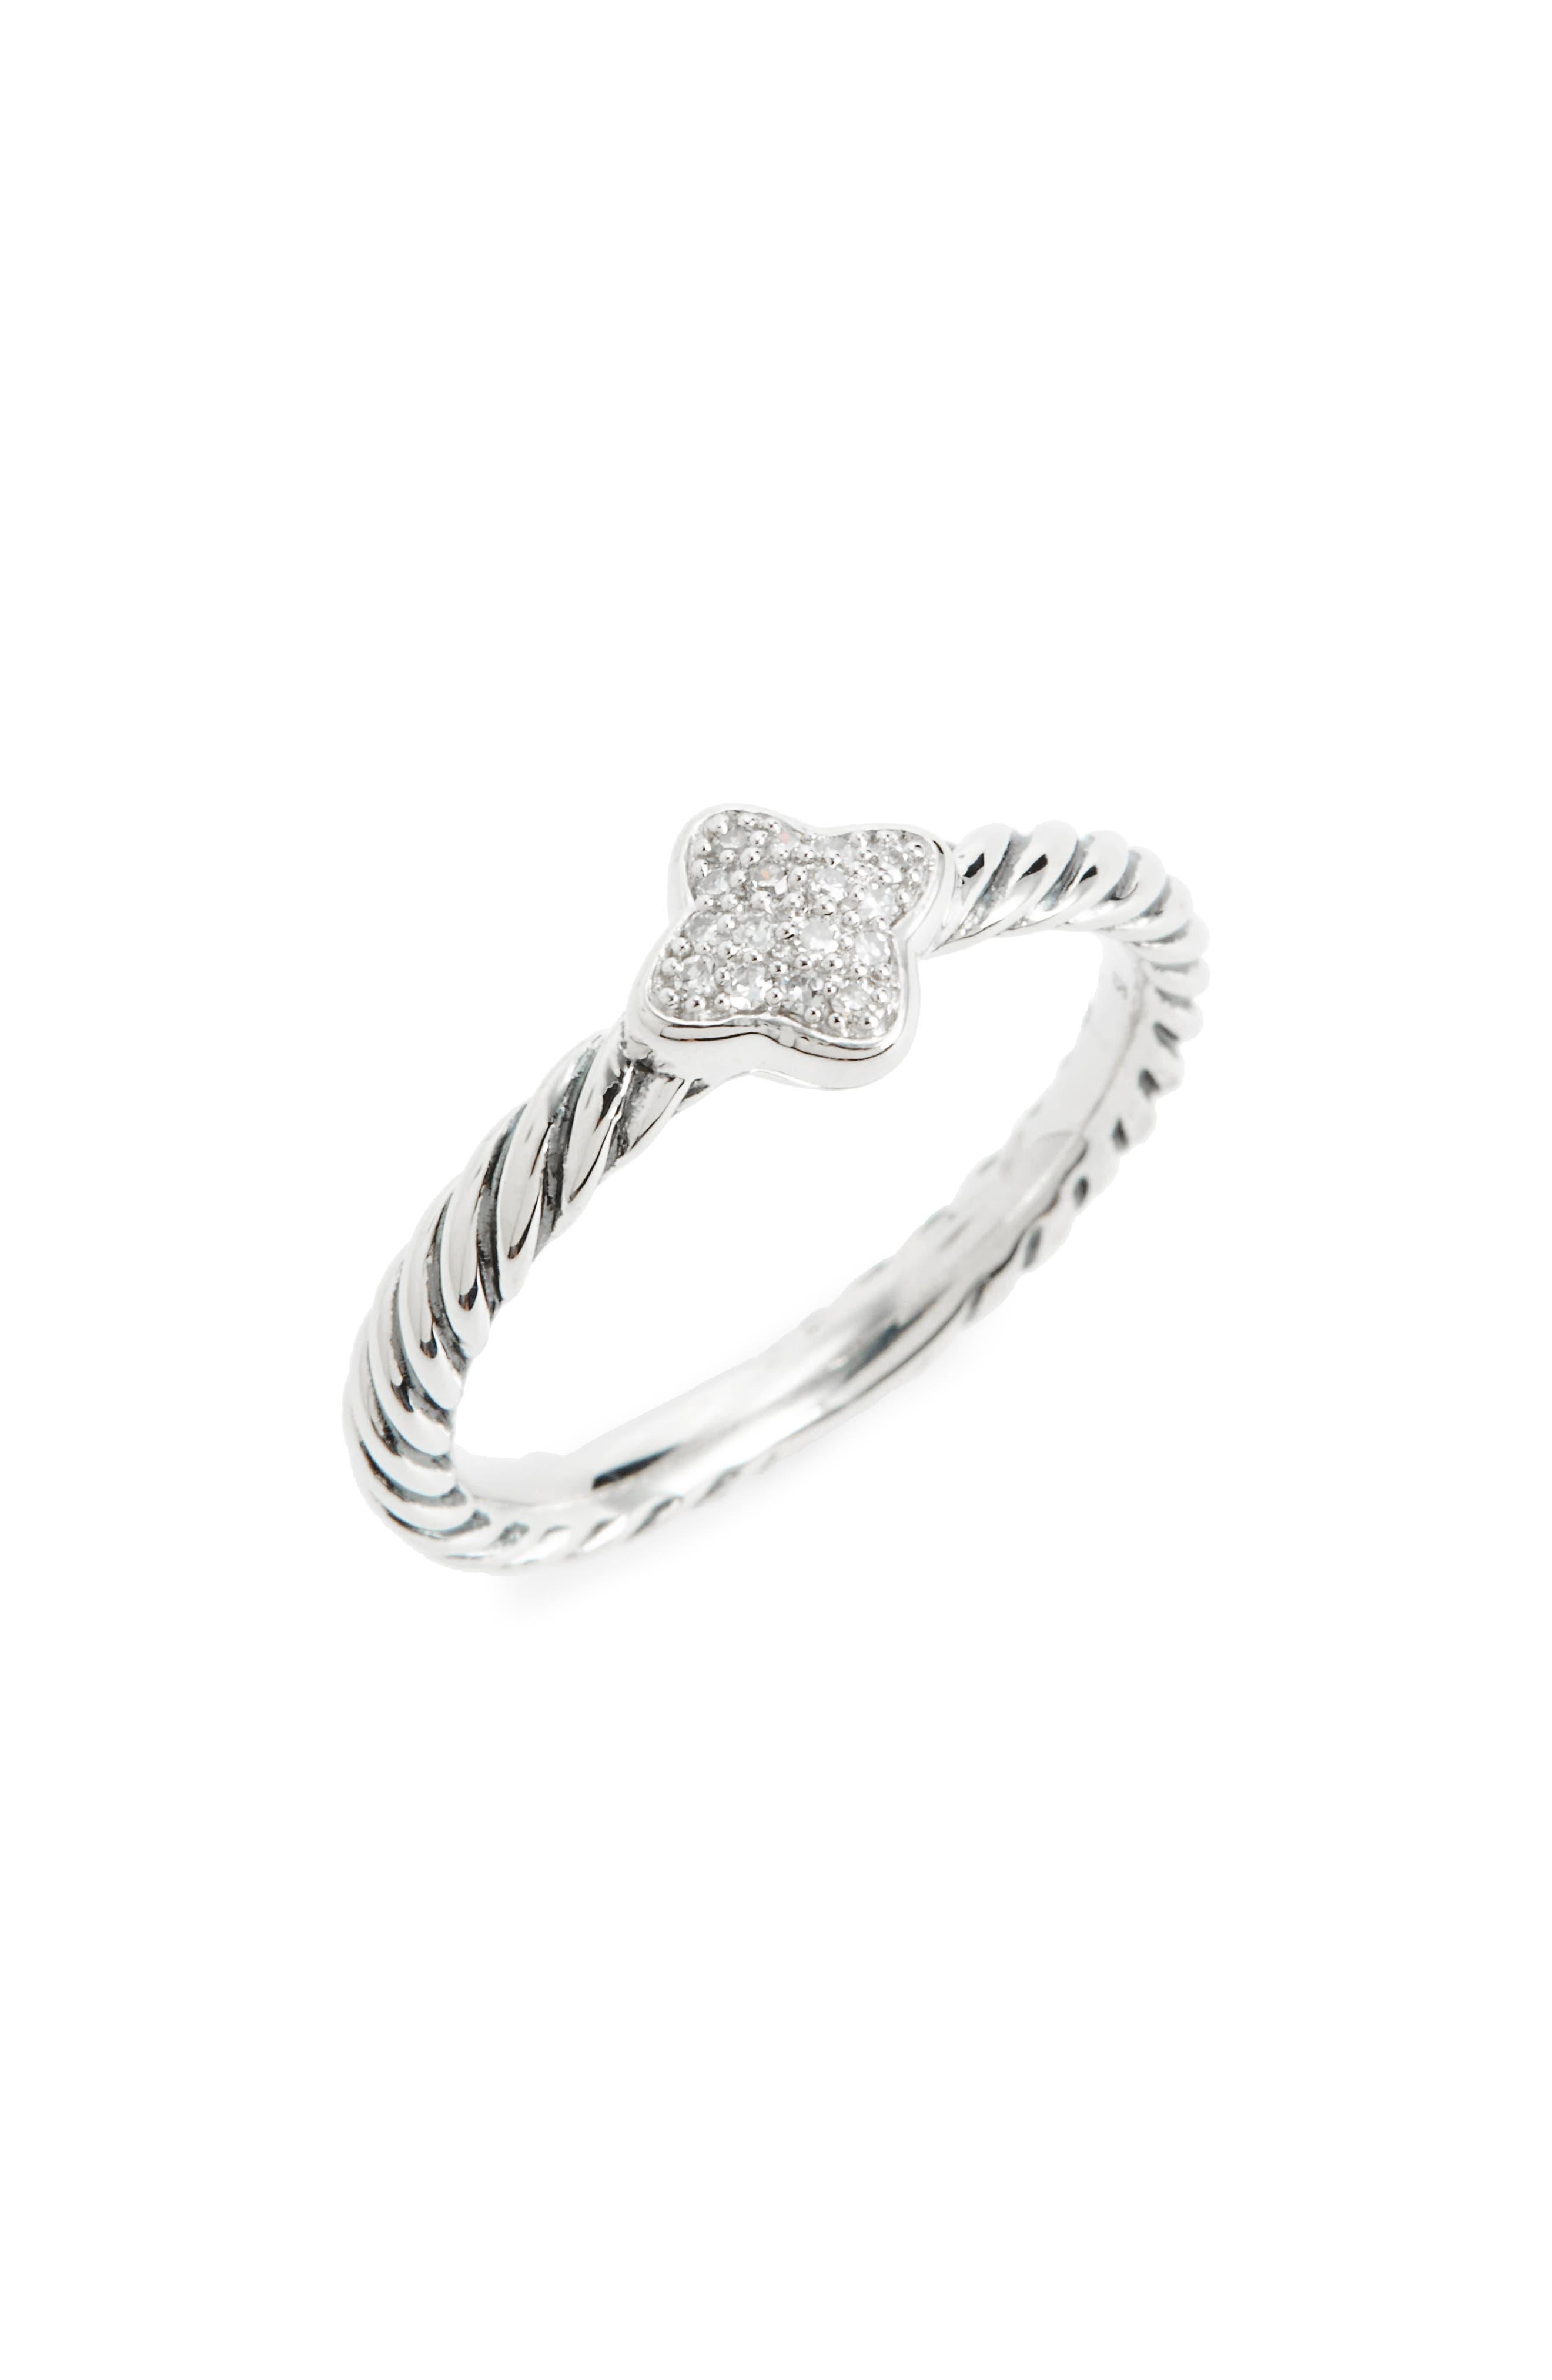 David Yurman Women s Jewelry Under $500